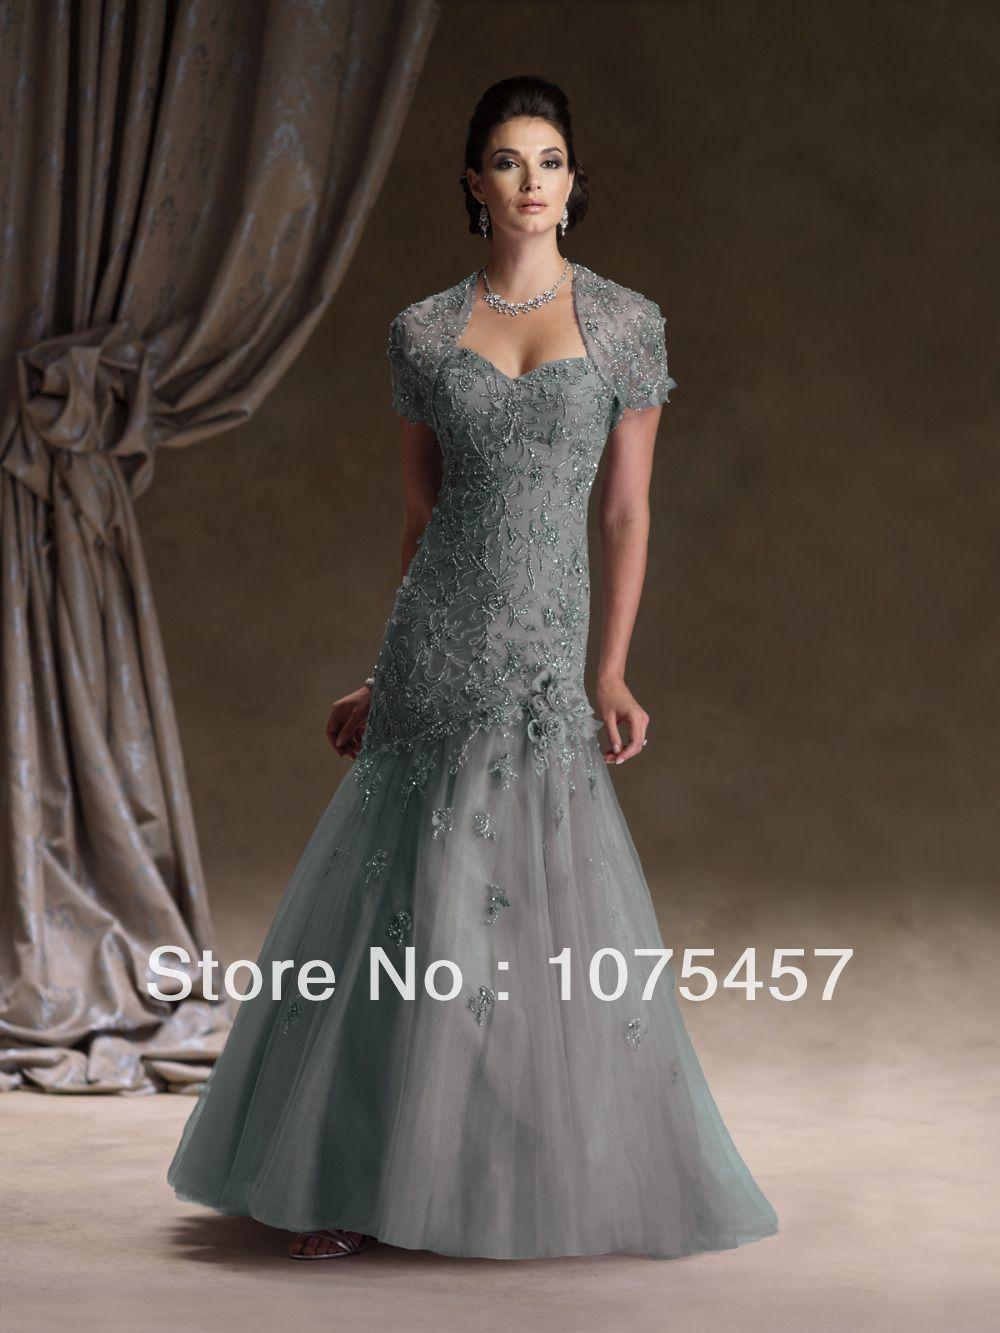 5e75cb094f779 Elegant Sweetheart Mother Bride Dress with Jacket Lace Bodice ...